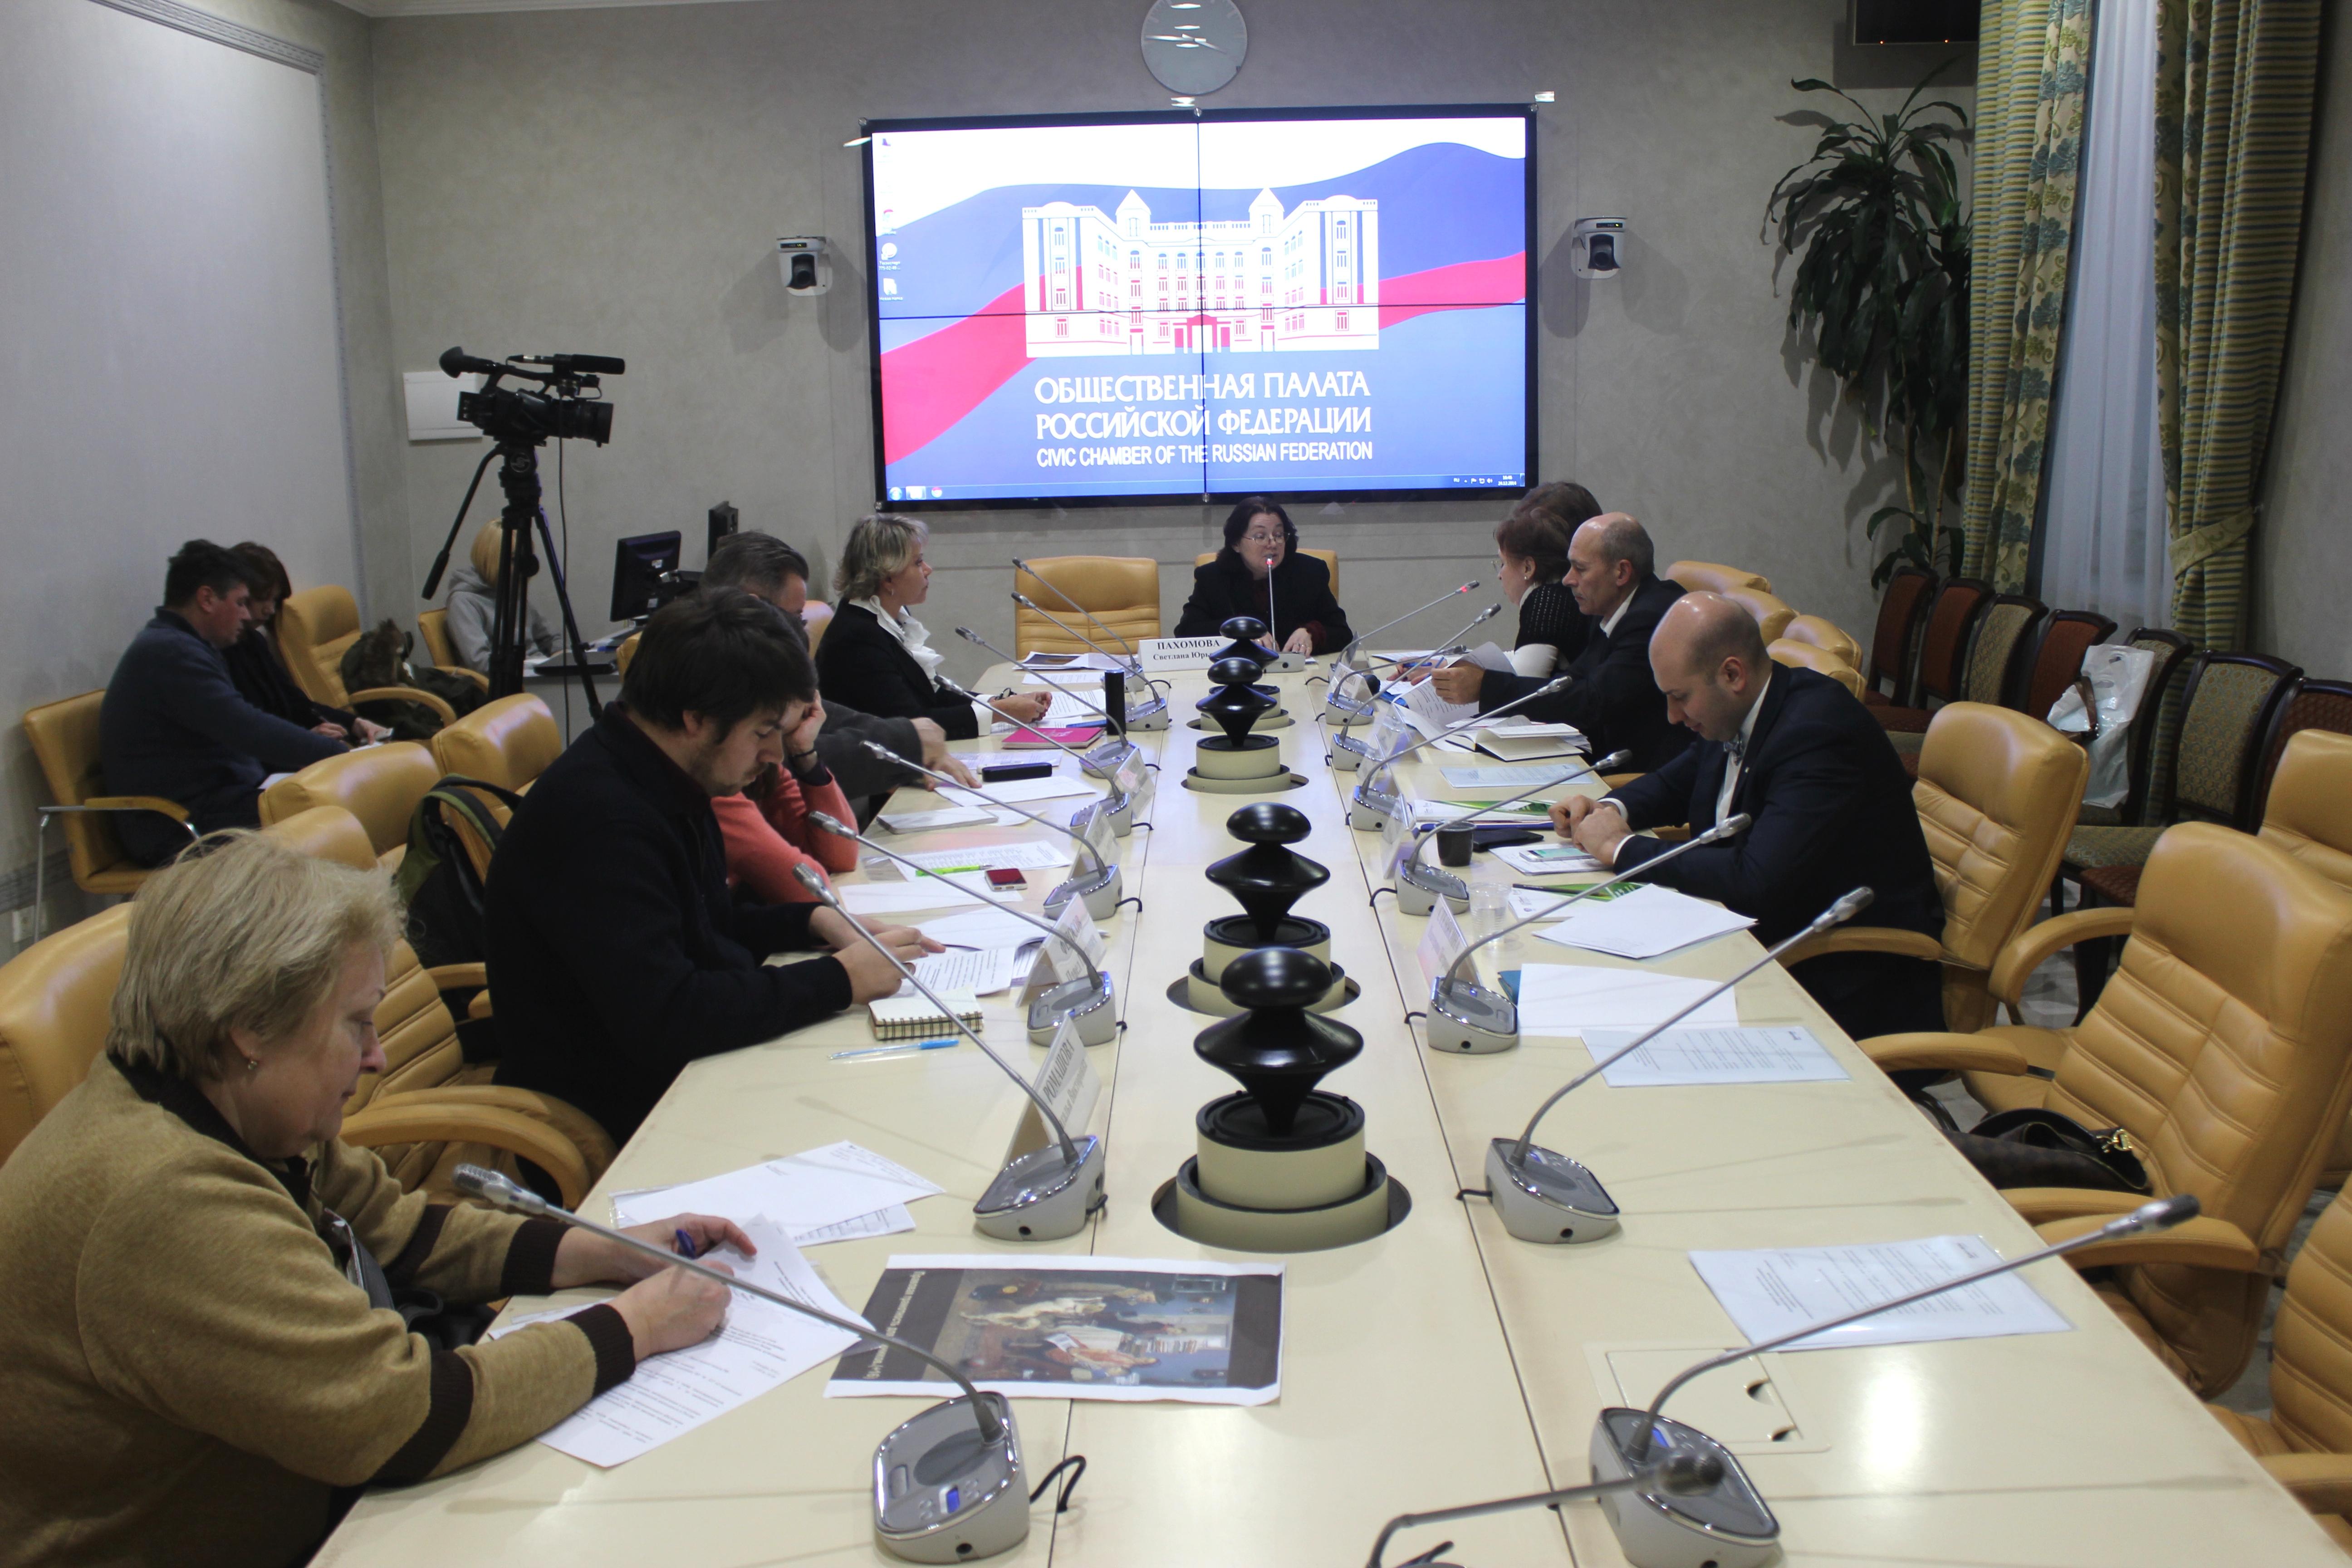 ОП РФ 2014